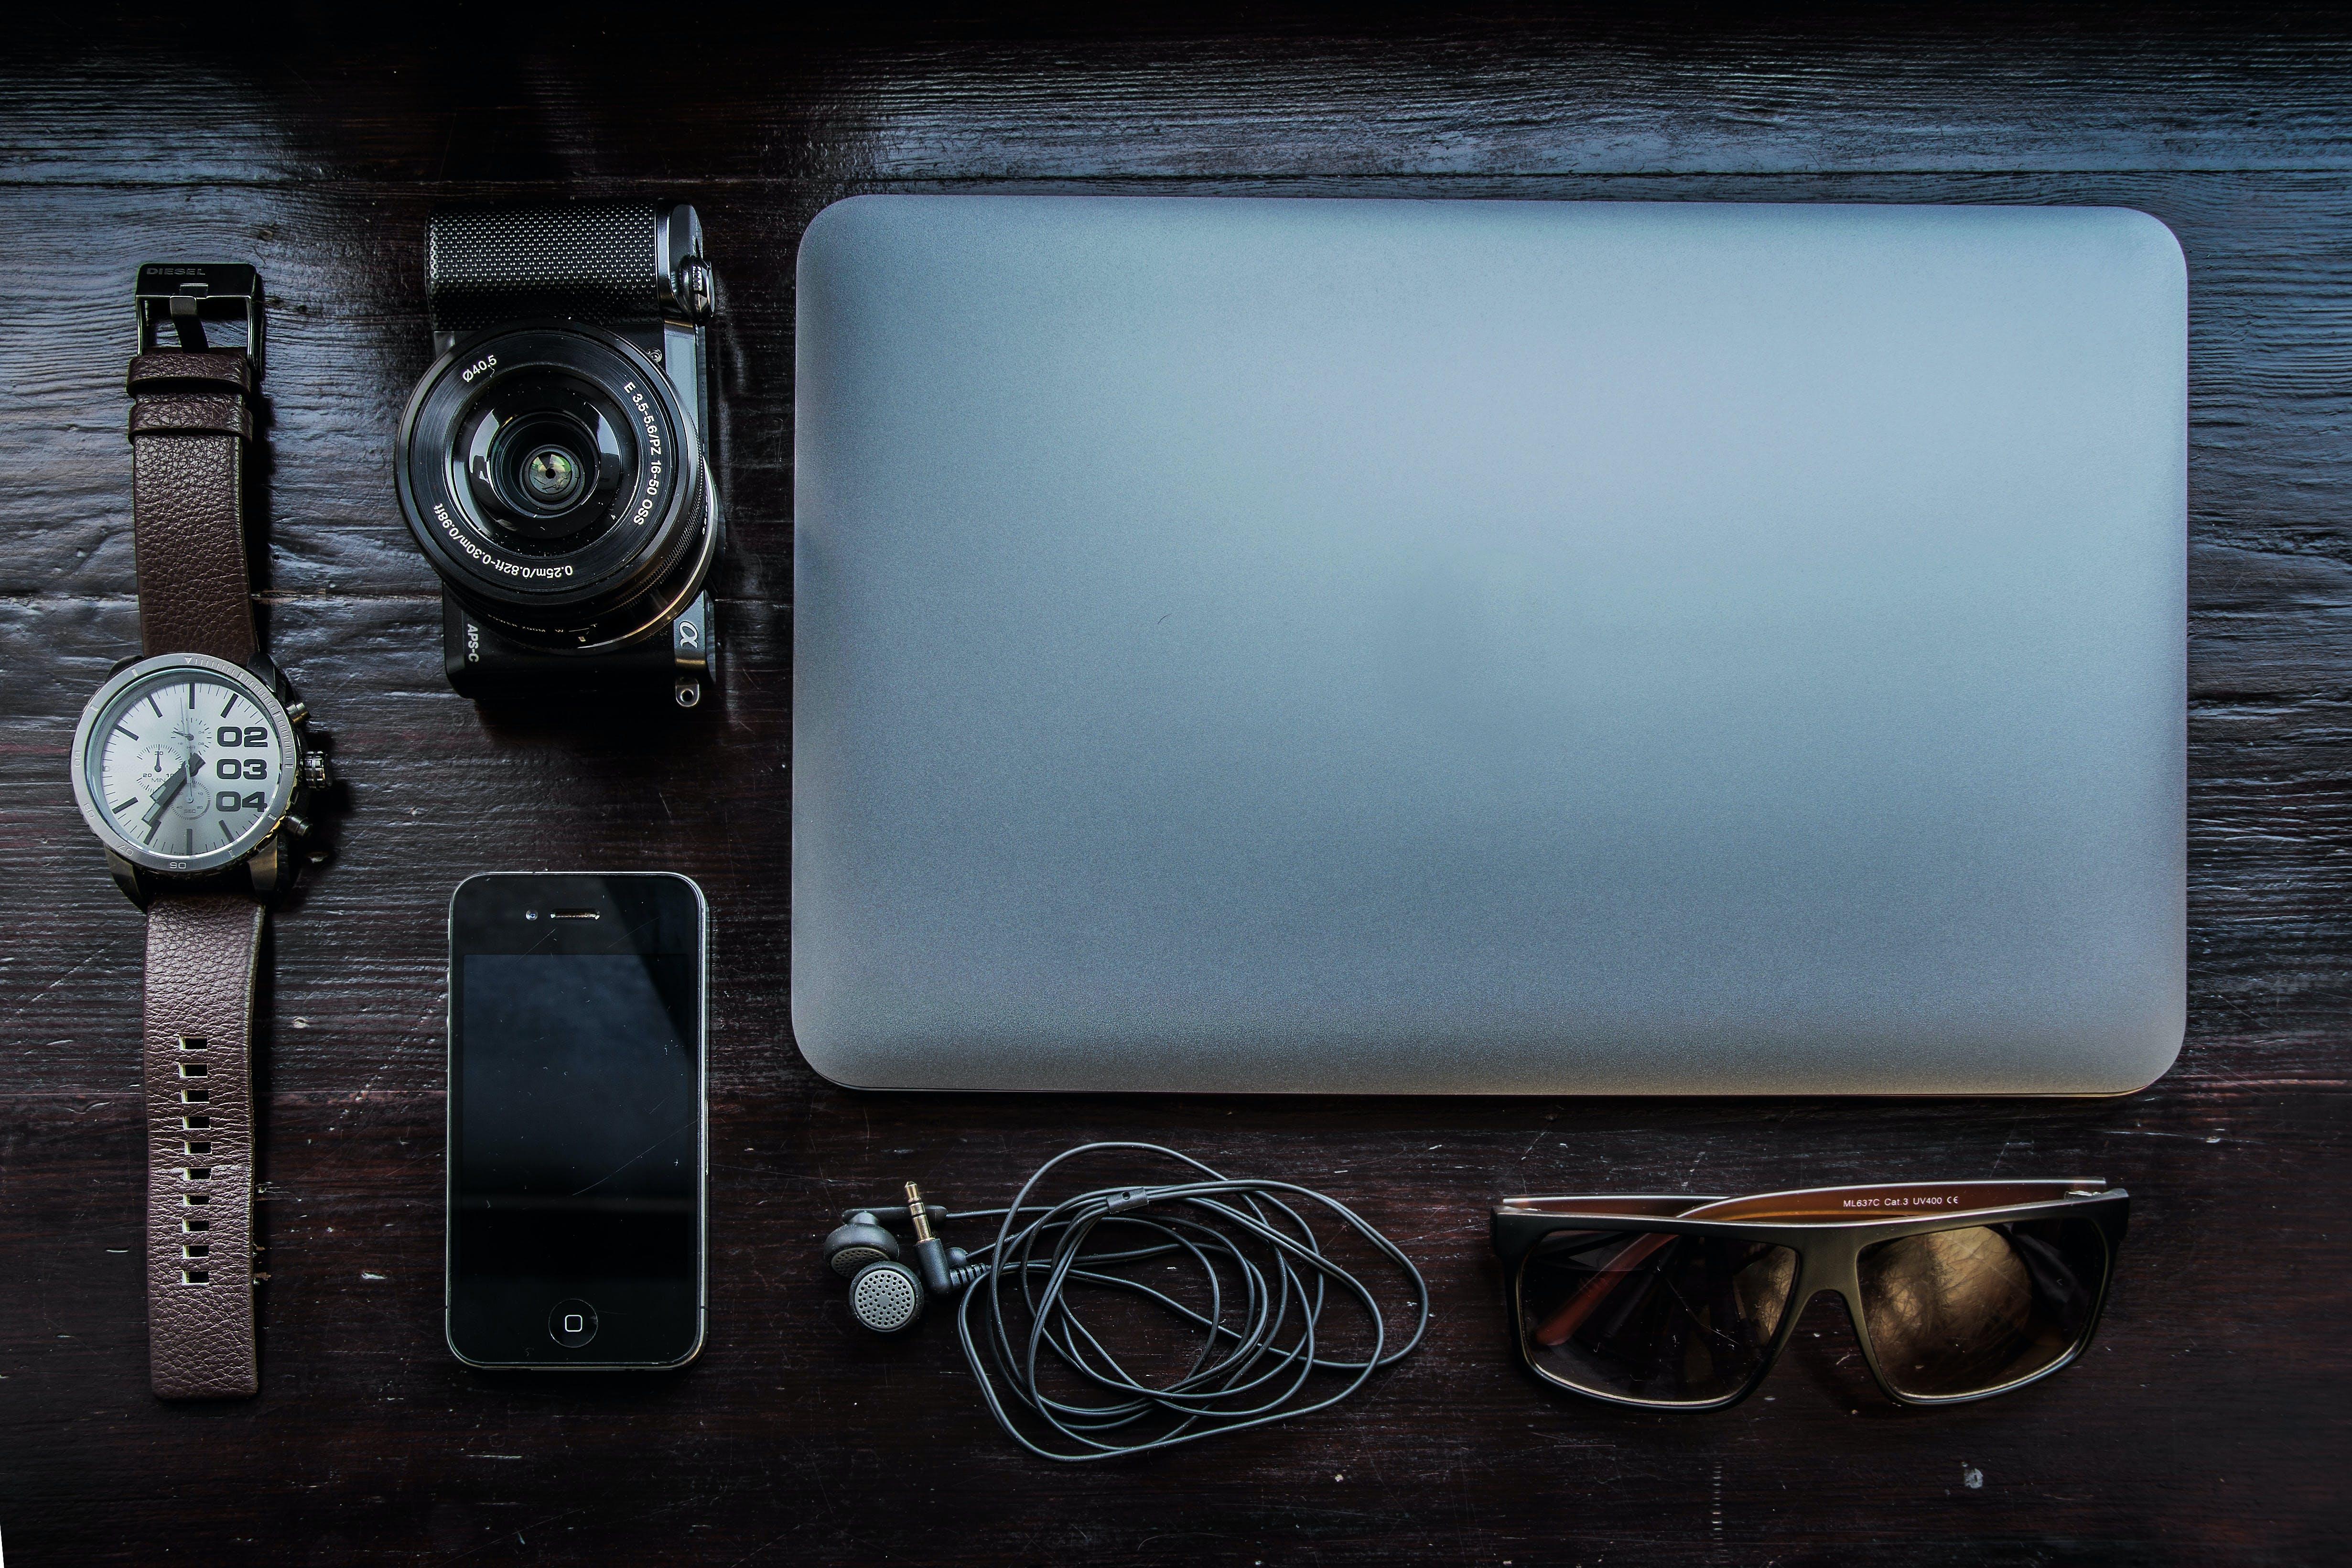 Silver Laptop Computer and Black Bridge Camera